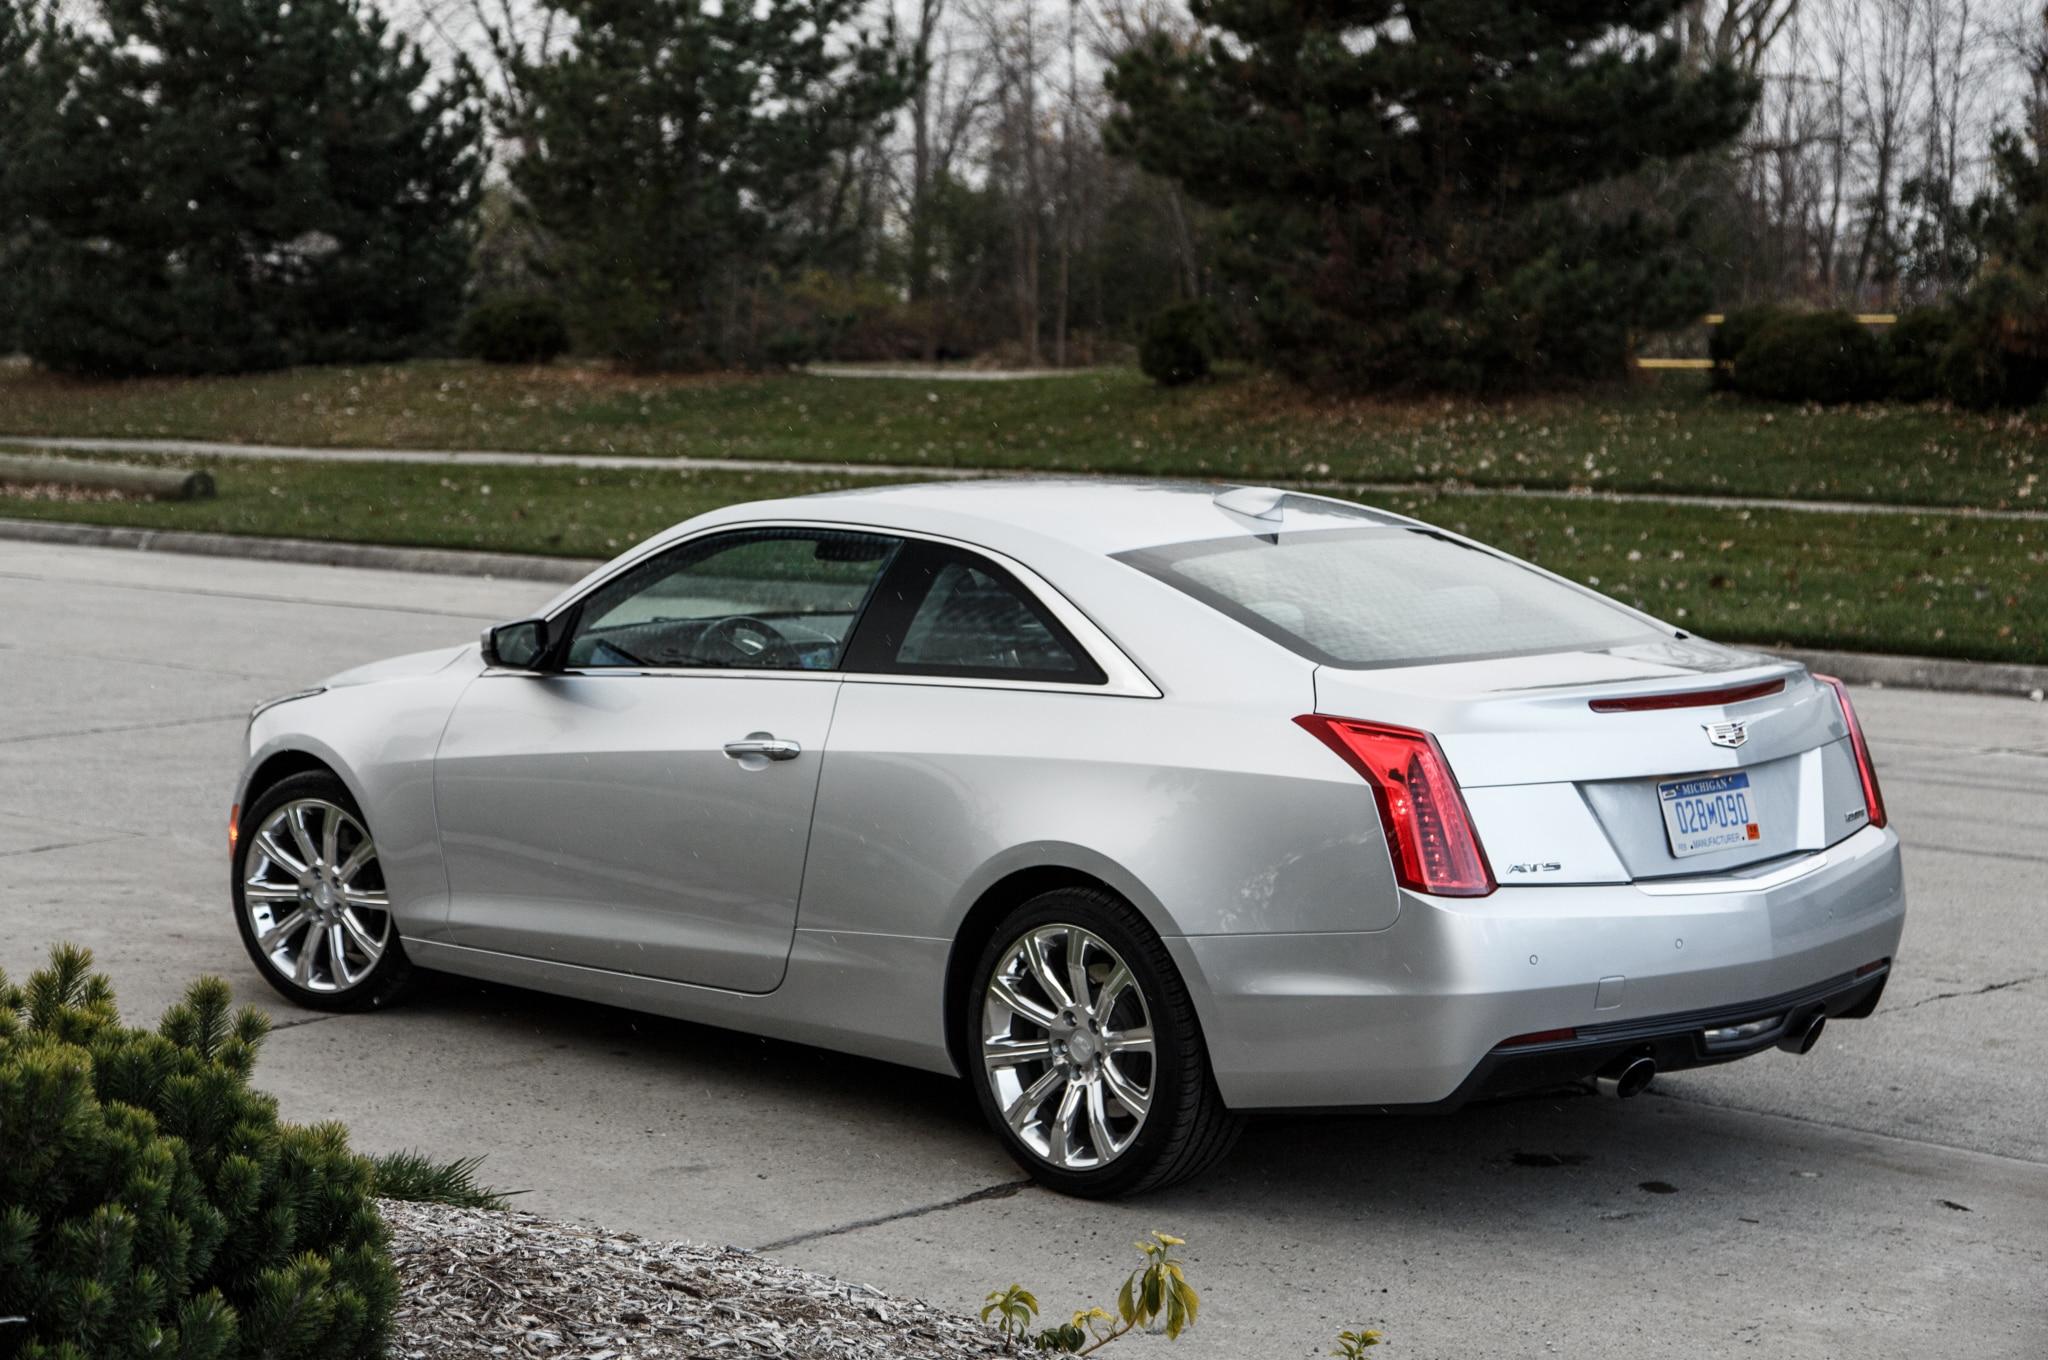 Cadillac Ats 2.0 T >> 2015 Cadillac ATS Coupe 2.0T Manual: Around the Block